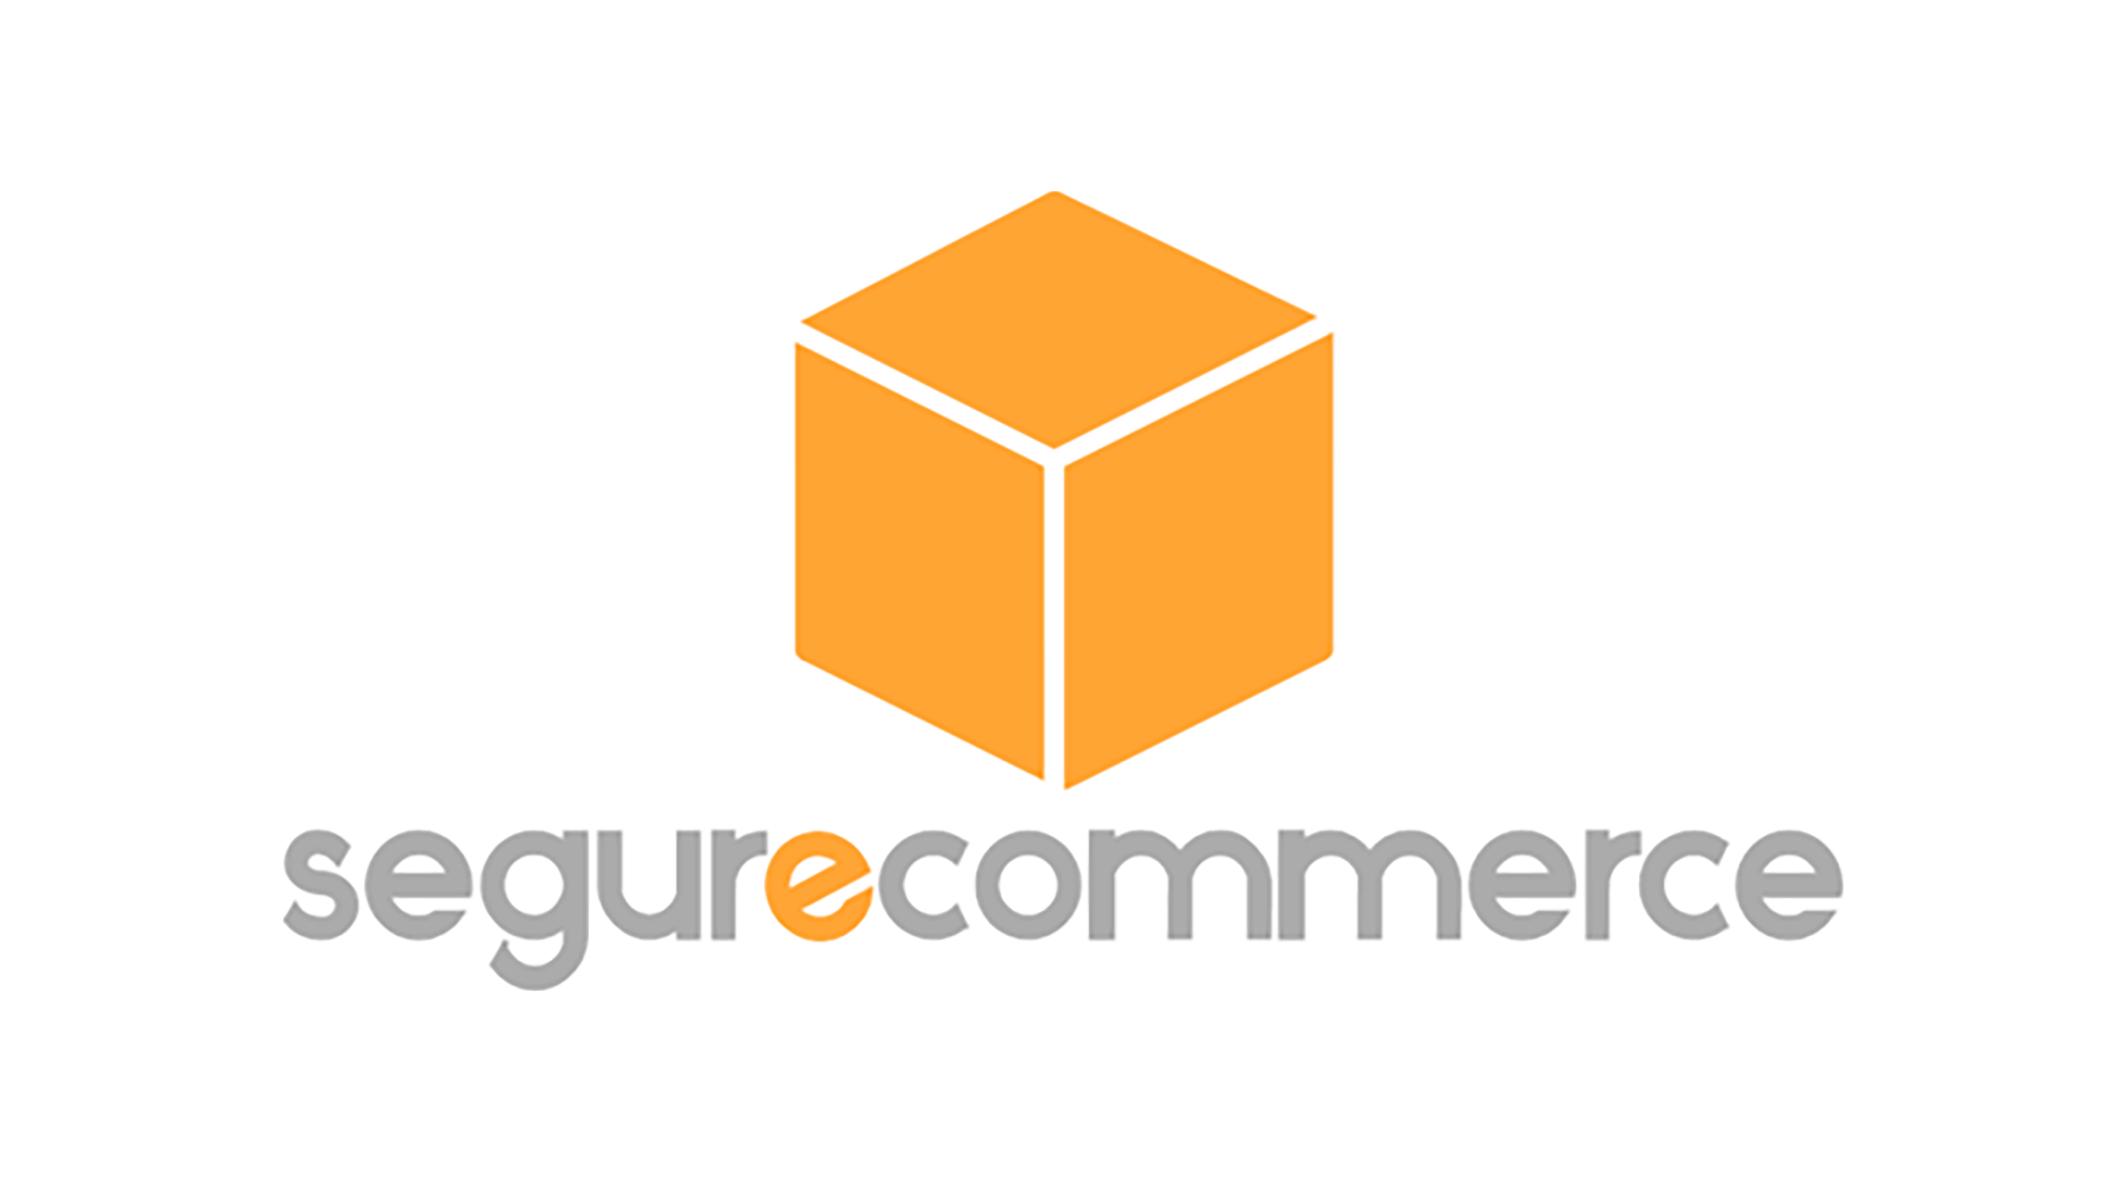 SEGURECOMMERCE - SIN FONDO 300ppp RGB